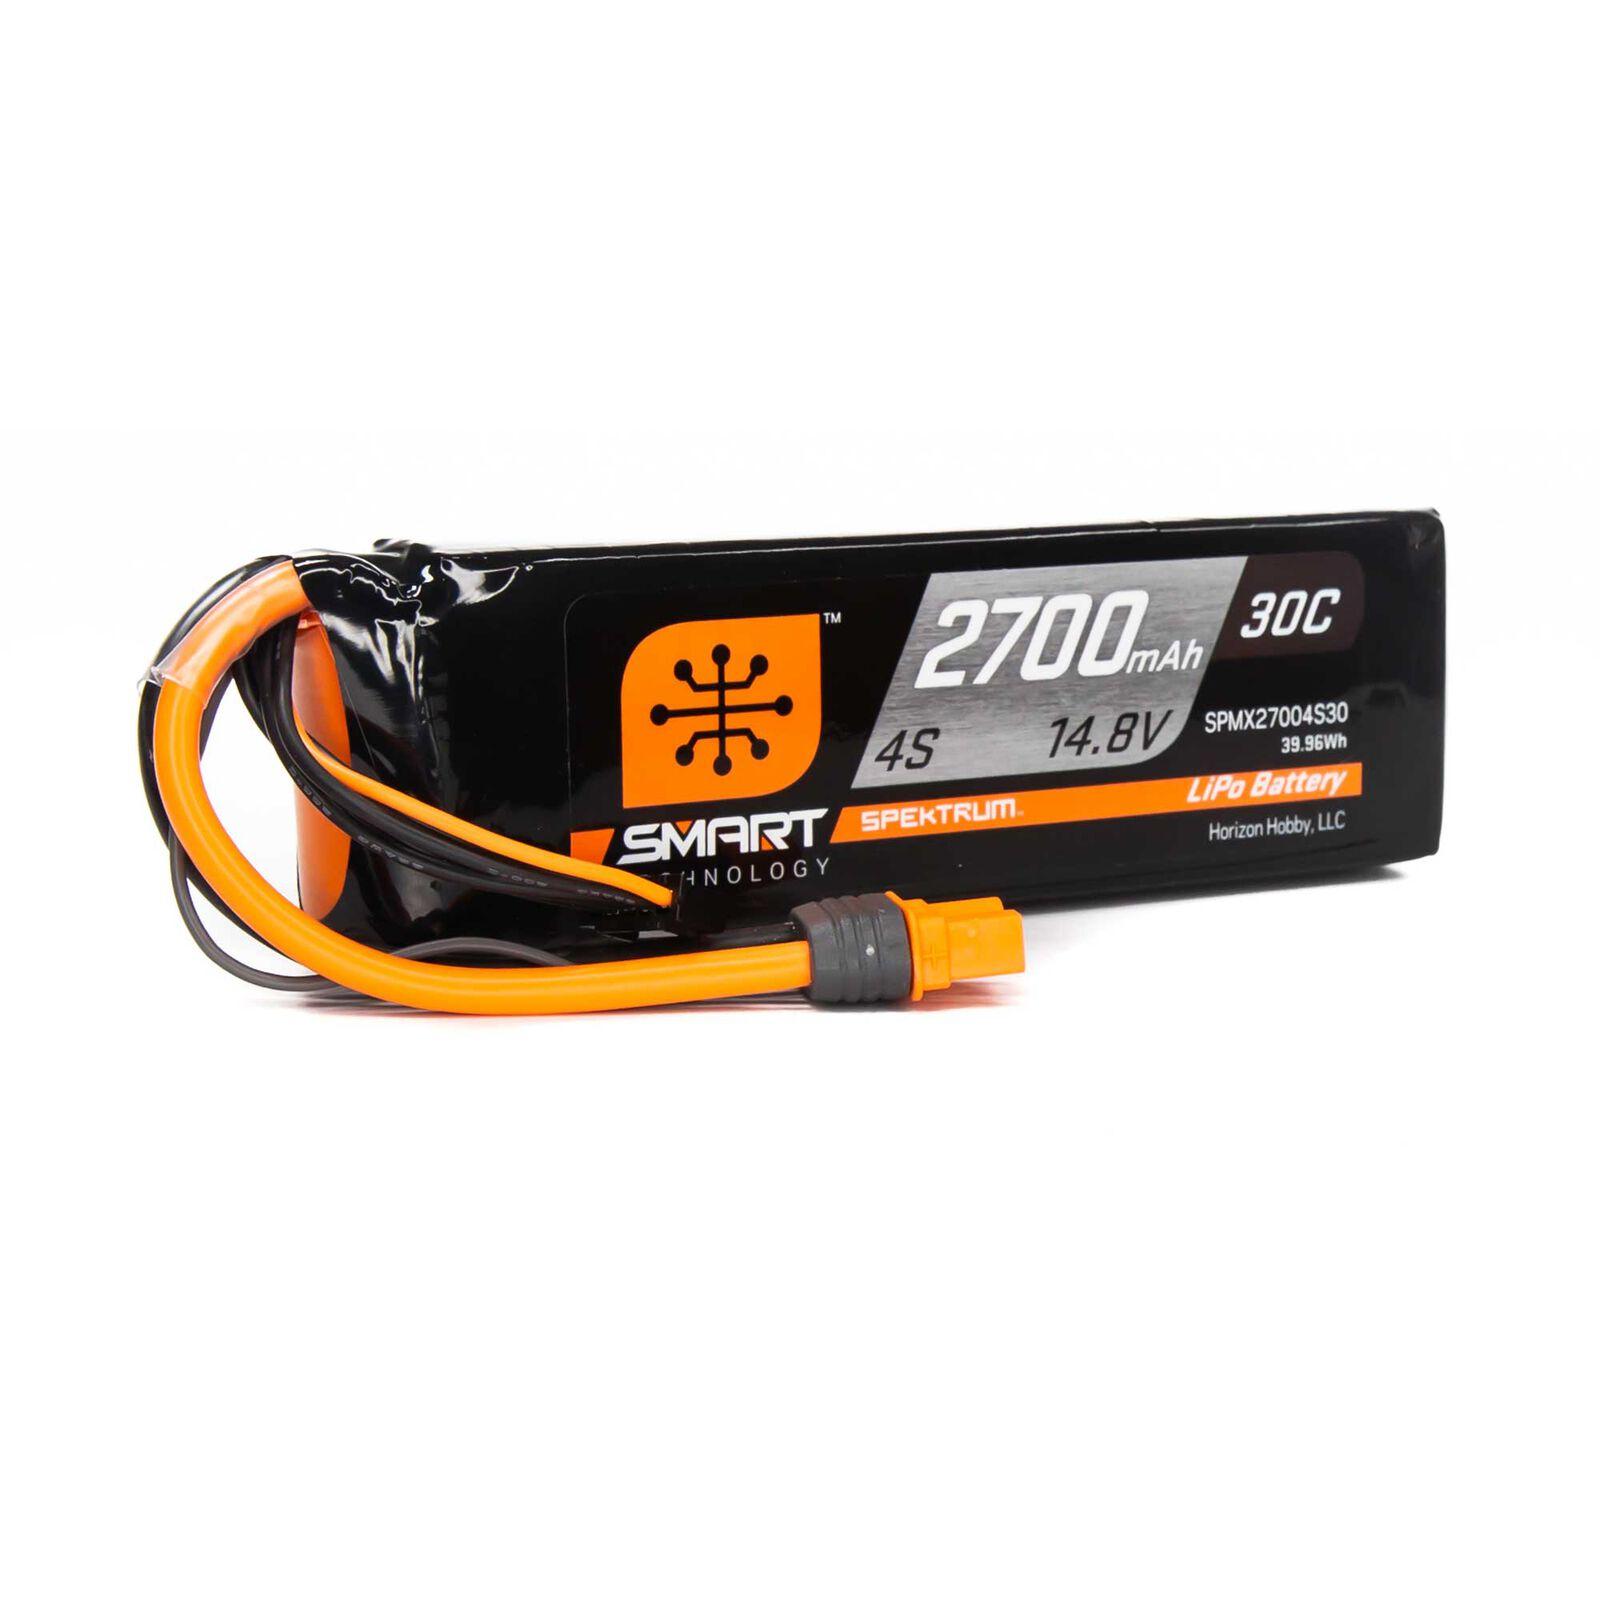 14.8V 2700mAh 4S 30C Smart LiPo Battery: IC3